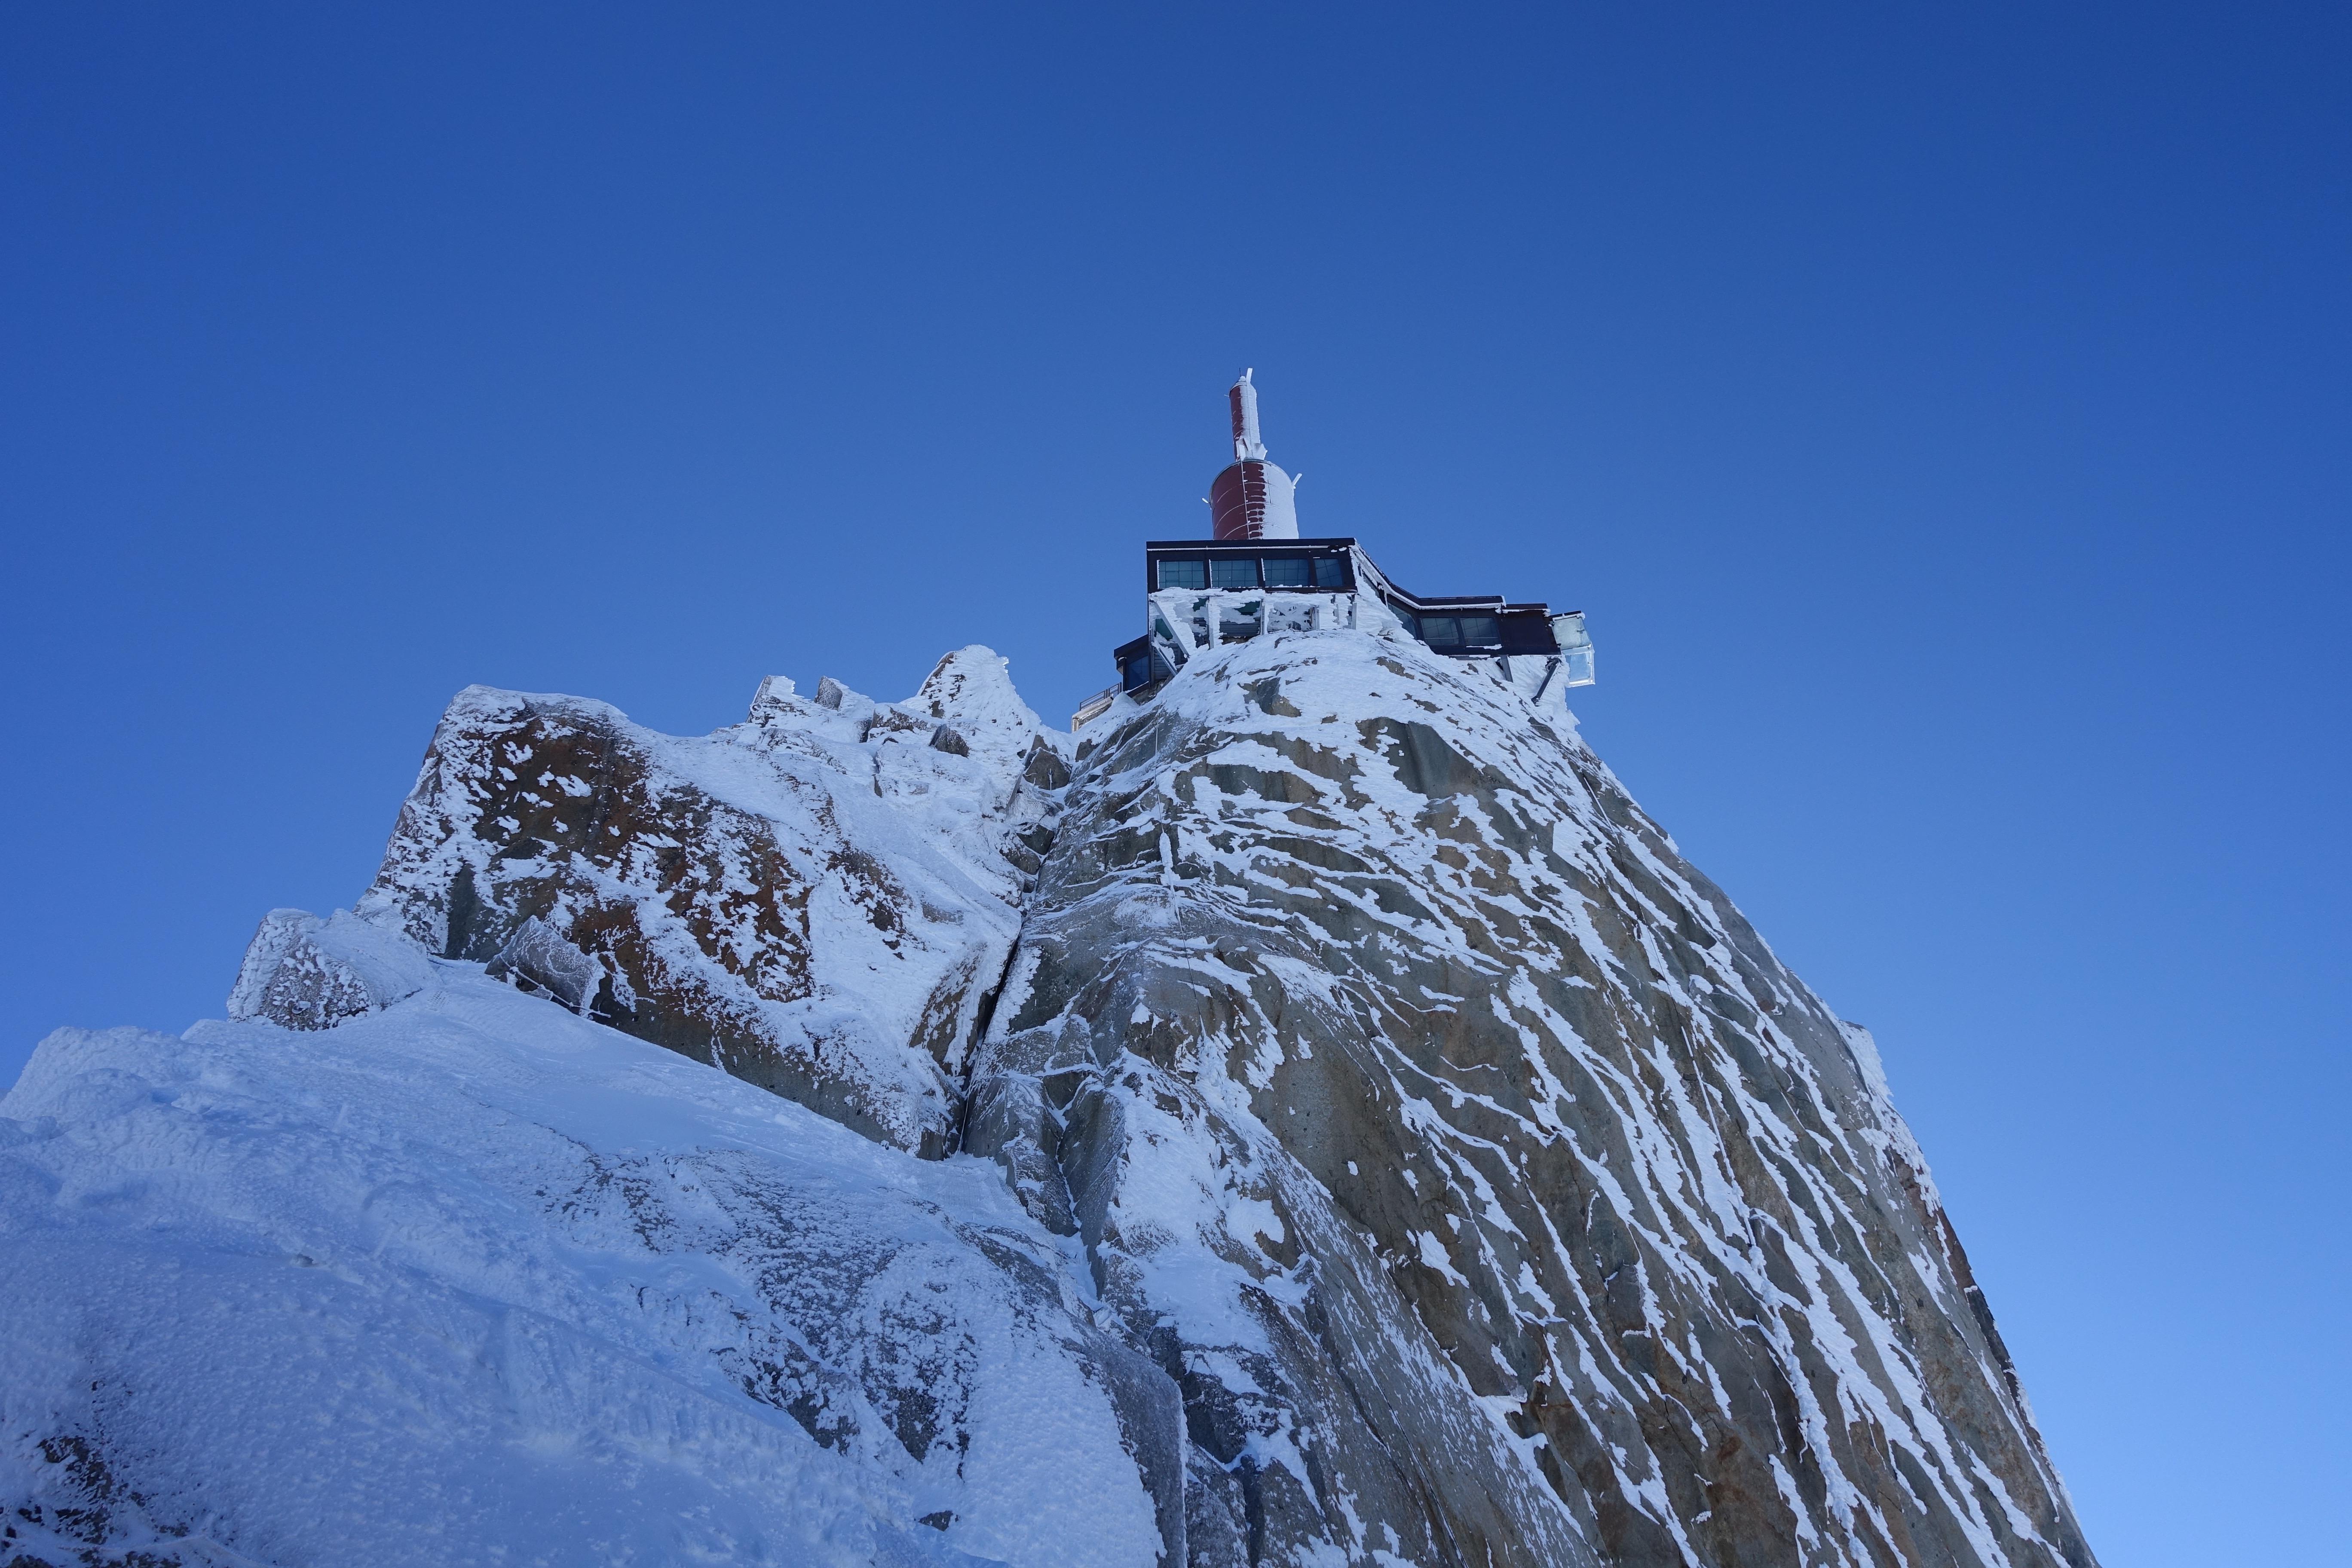 Sightseeing in Chamonix